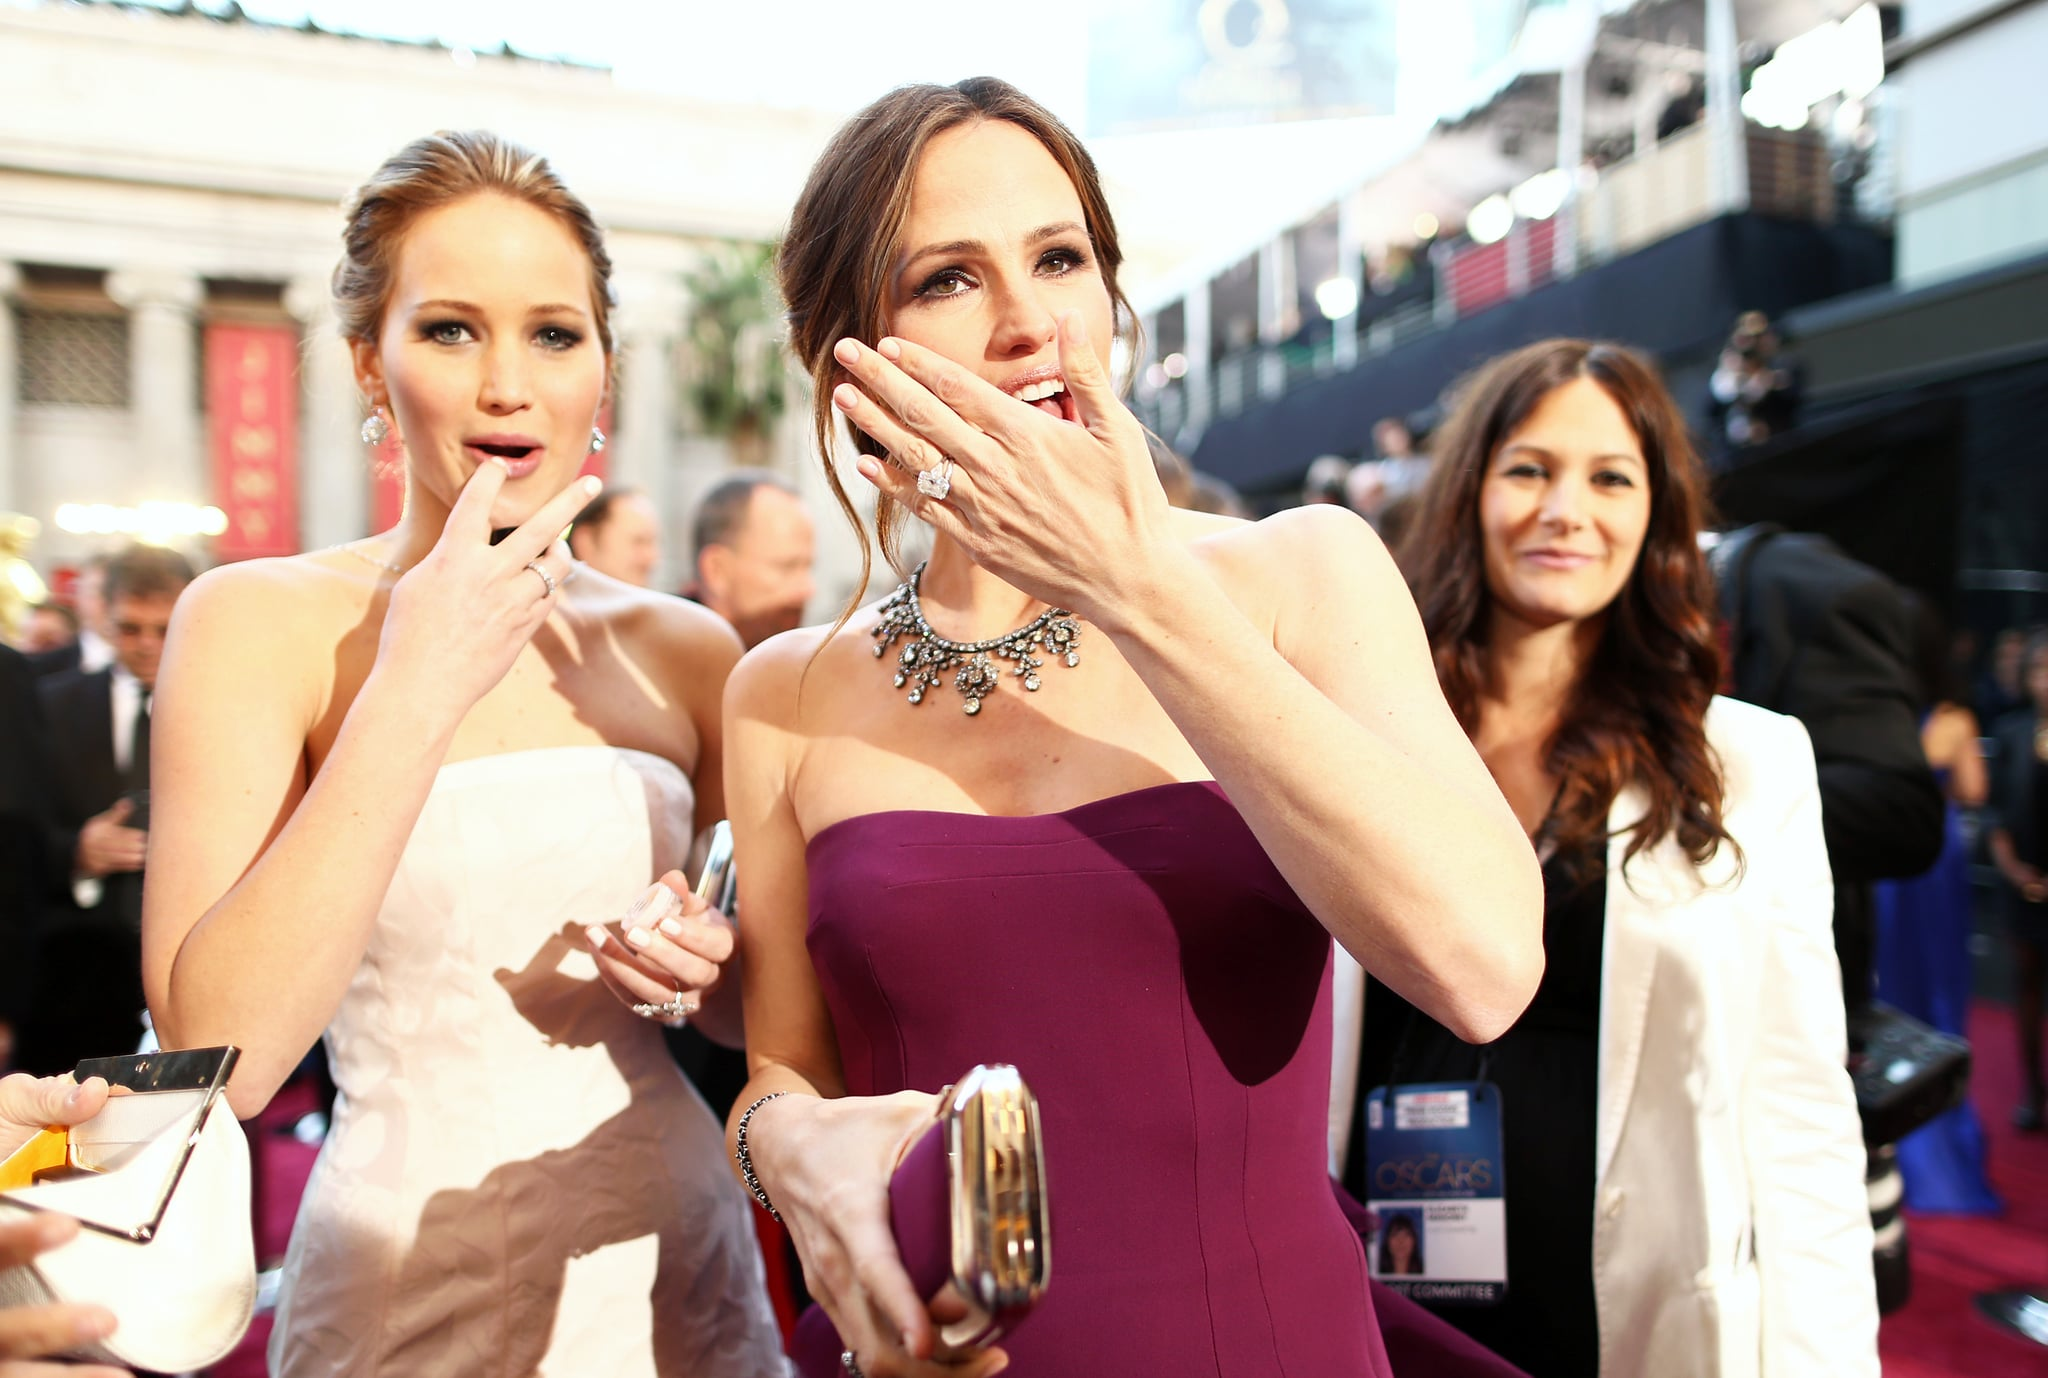 Jennifer Lawrence and Jennifer Garner had a candid moment.